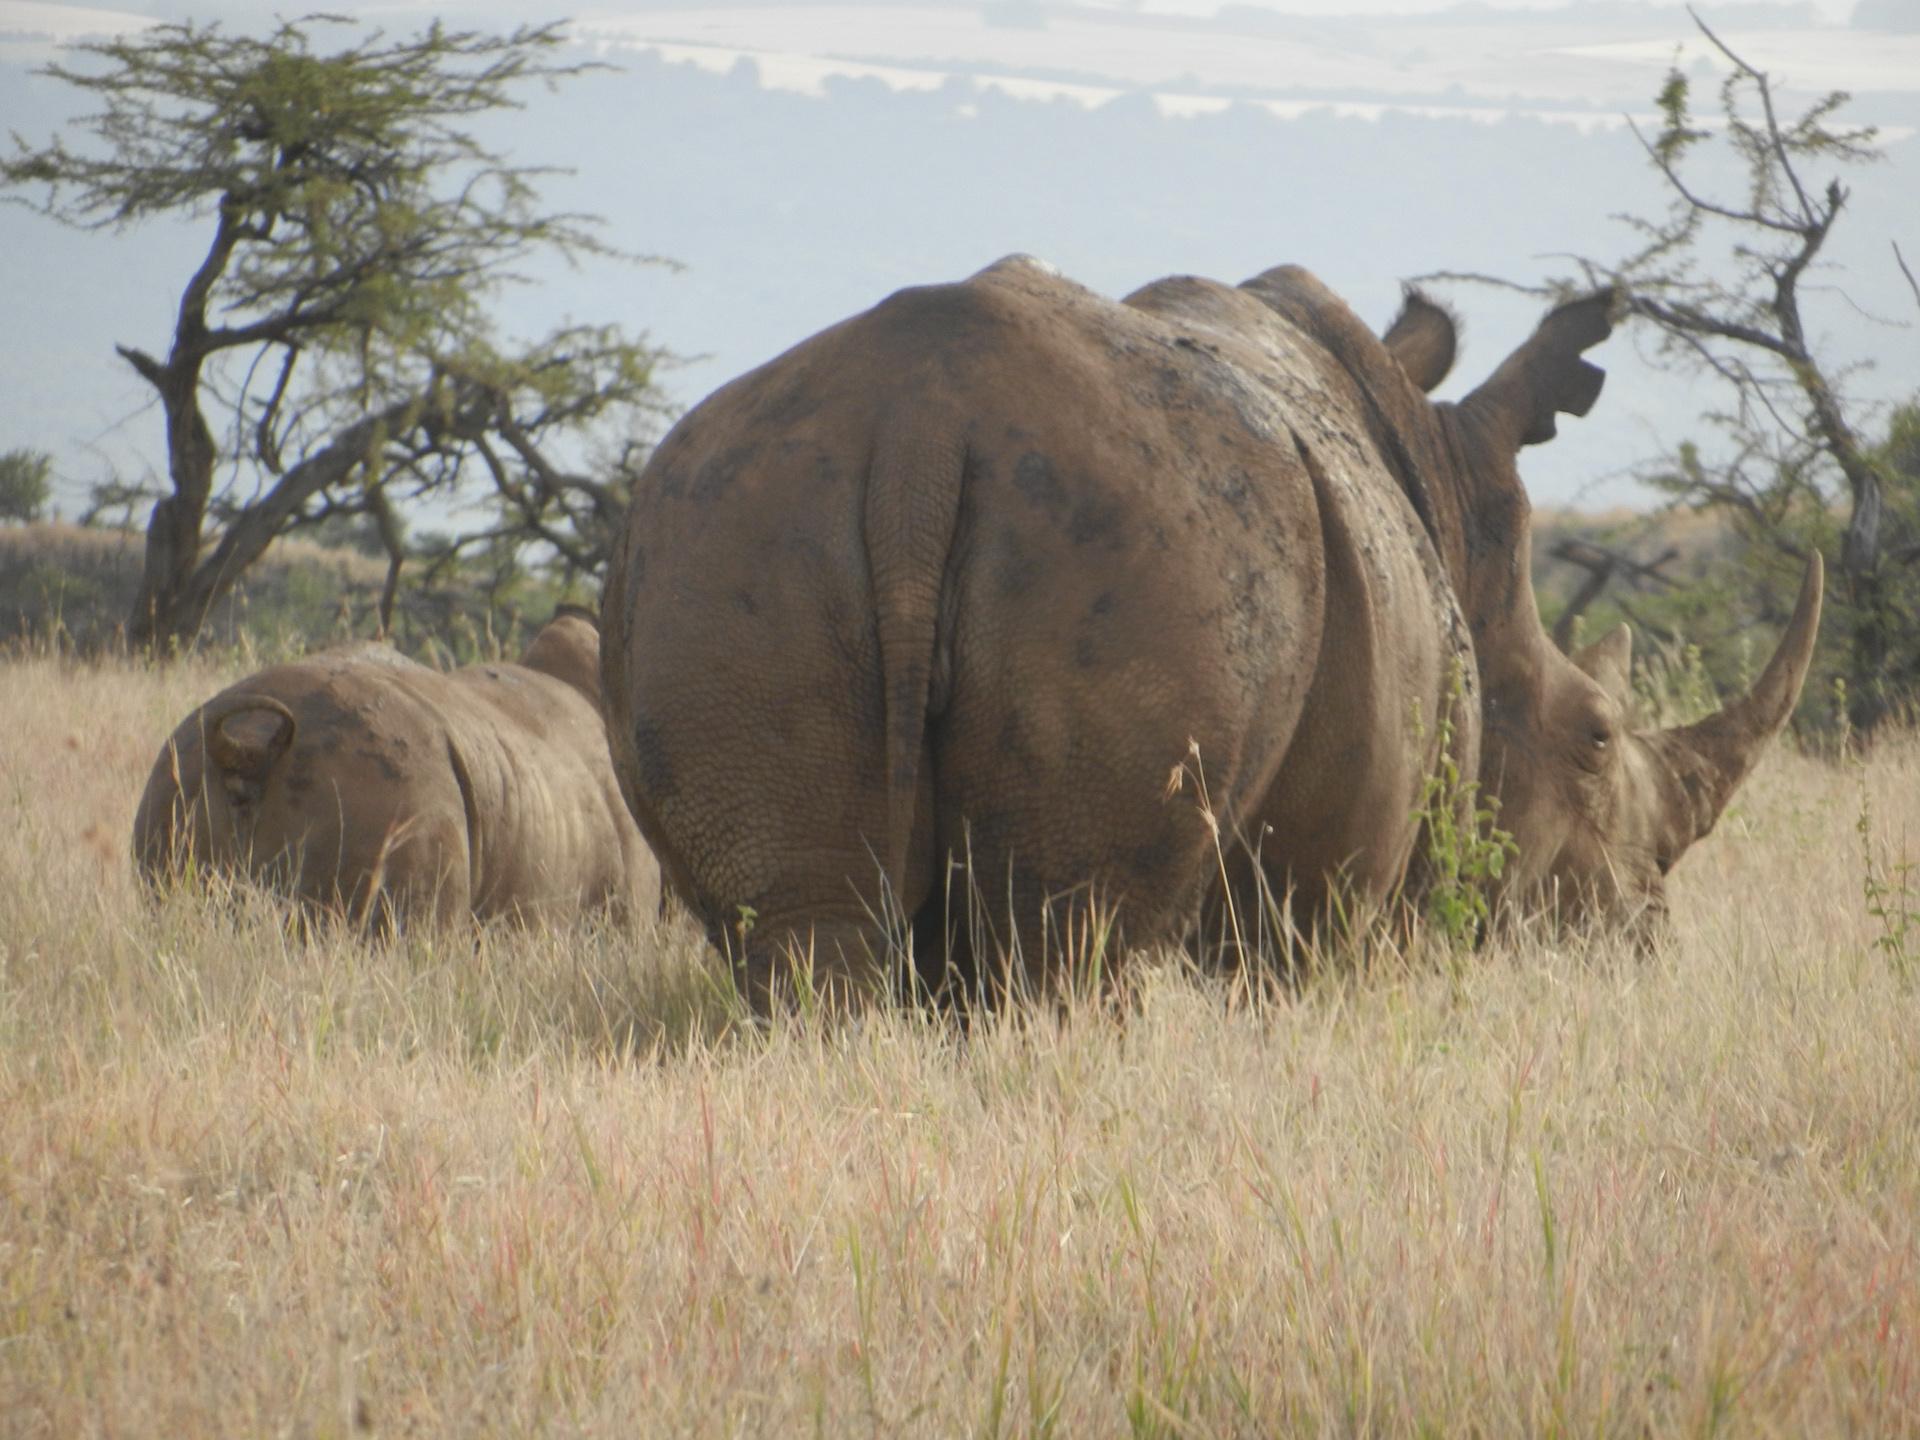 Rhino and calf, Lewa Conservancy, Africa, 2012